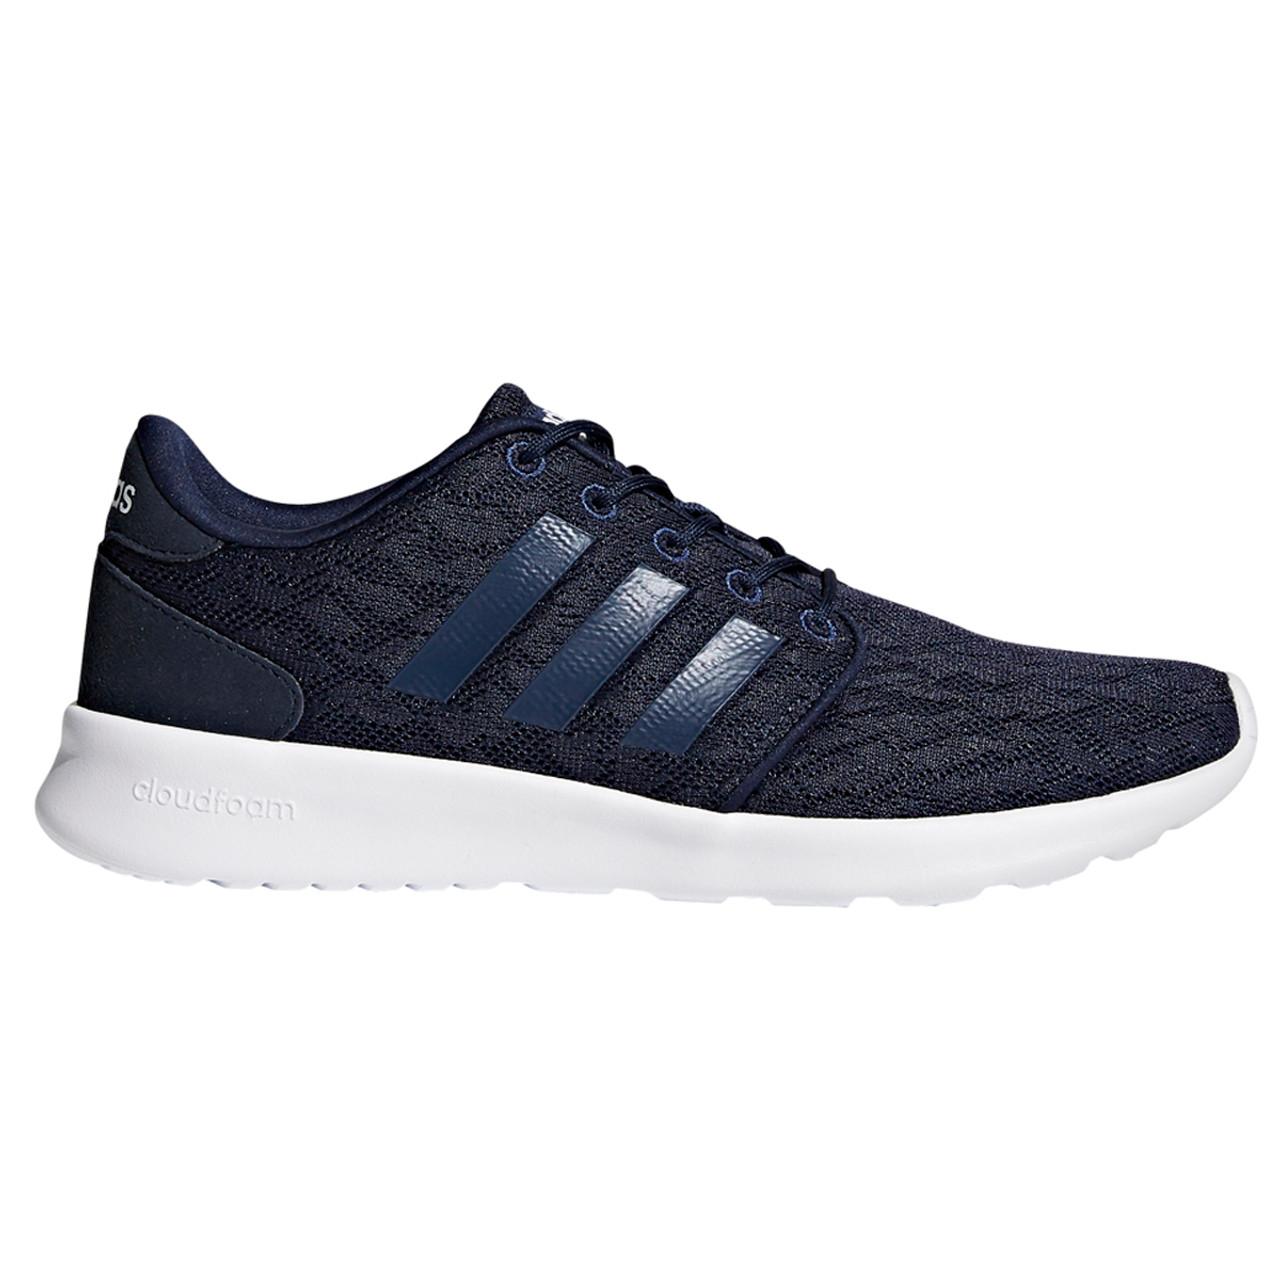 Adidas cloudfoam qt racer donne scarpa bb9846 miglior prezzo